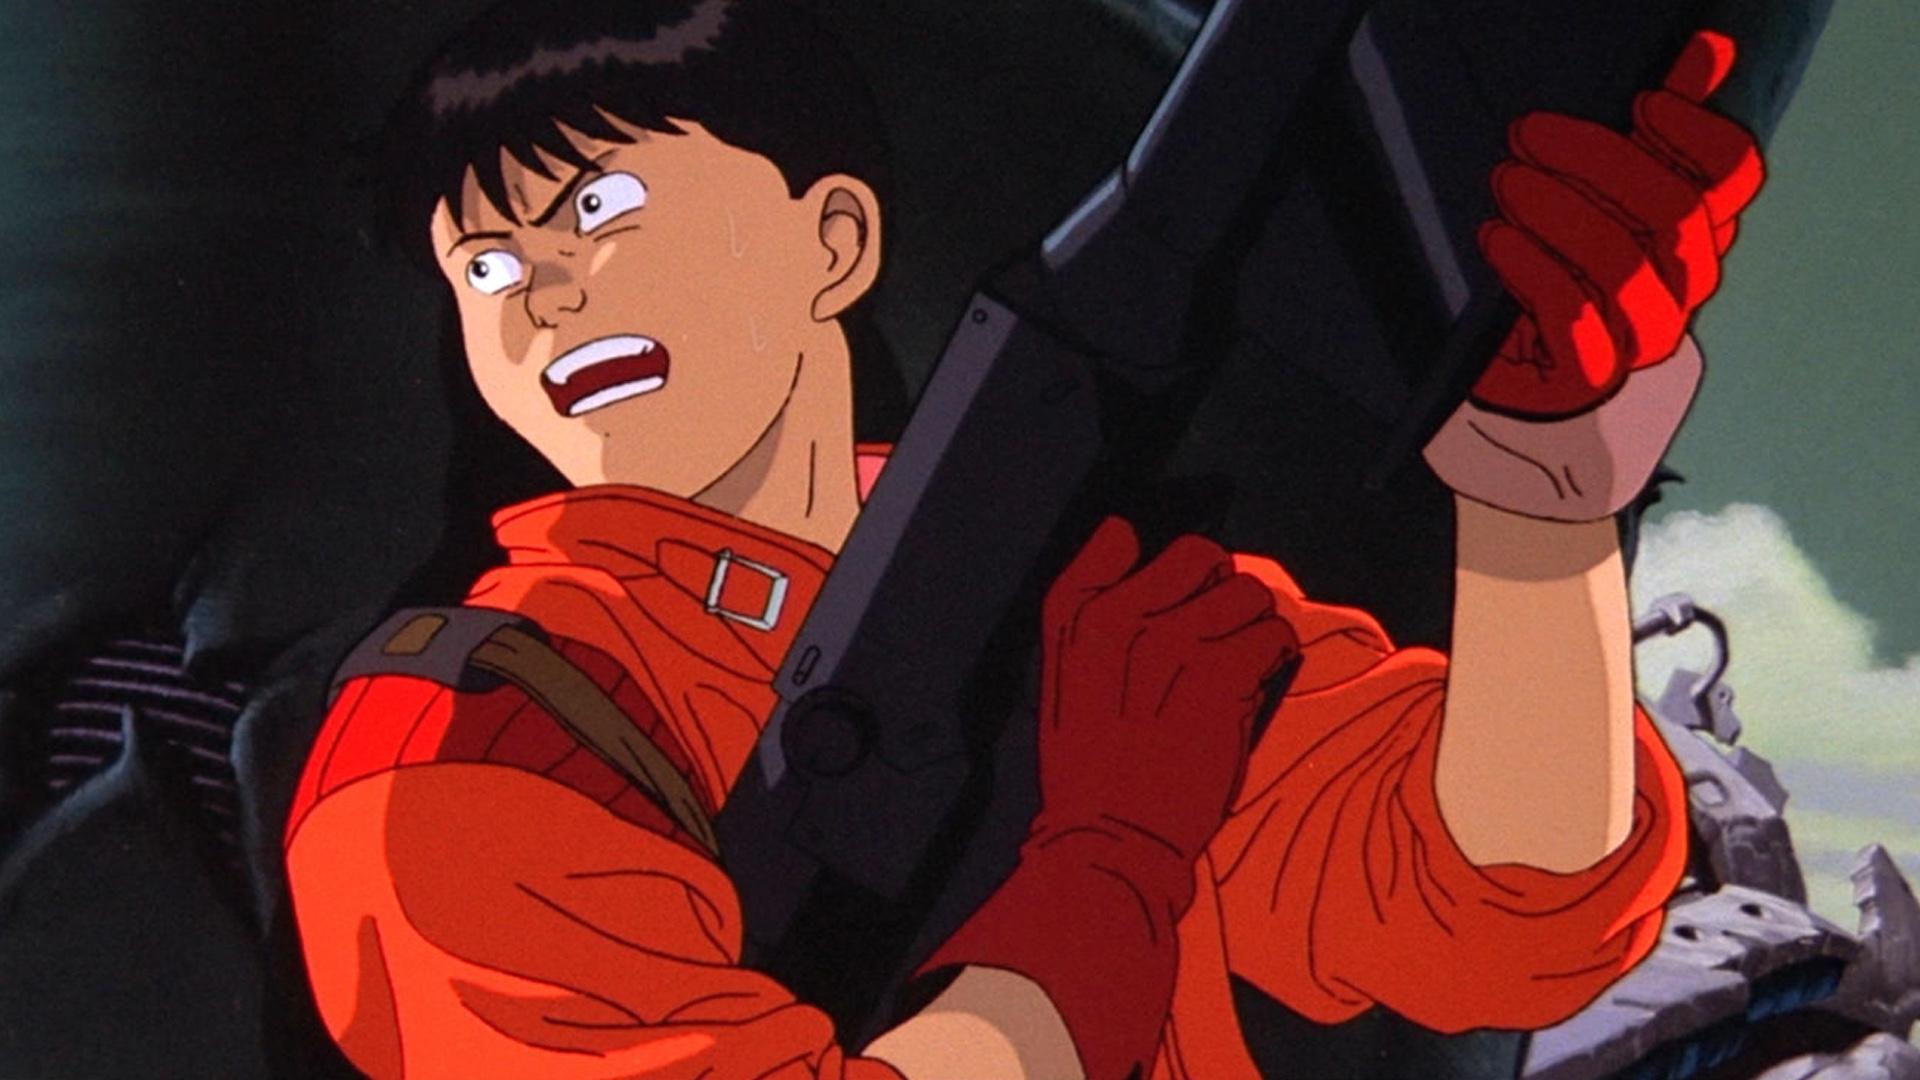 AKIRA Creator Katsuhiro Otomo Has Final Approval Over The Live-Action Film  Concept — GeekTyrant